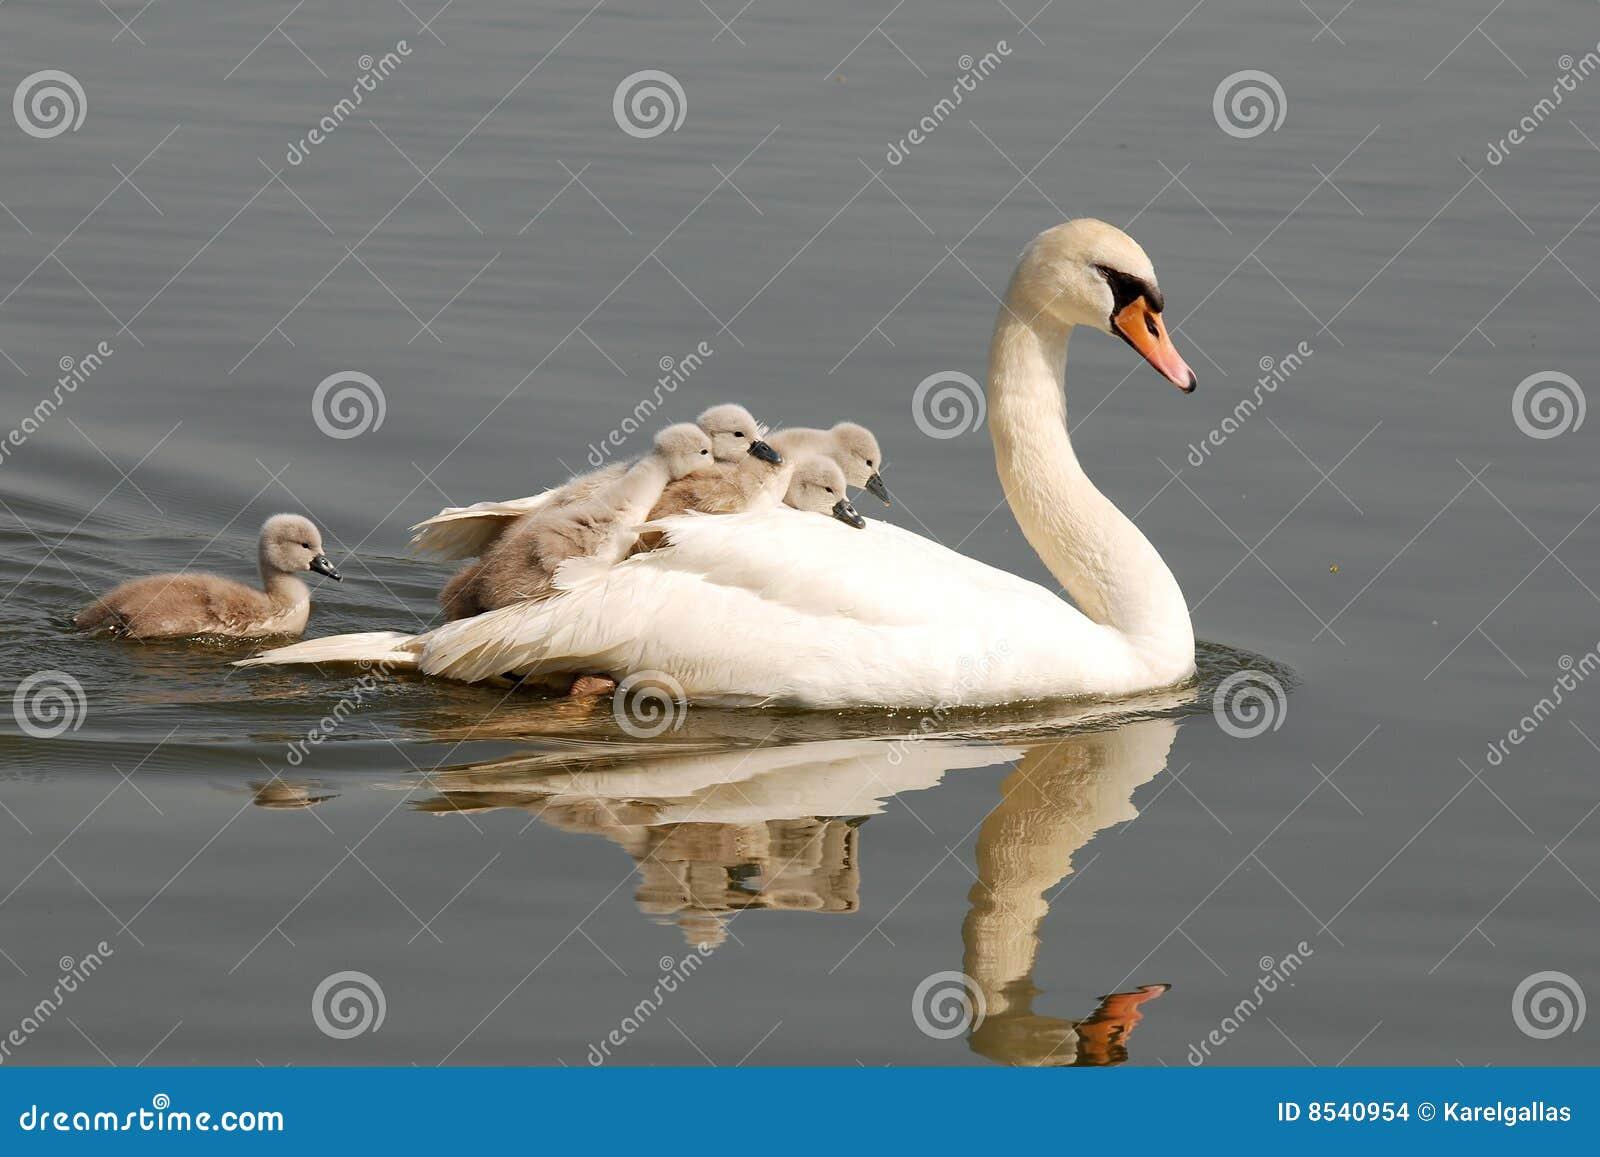 Fågelungeswan